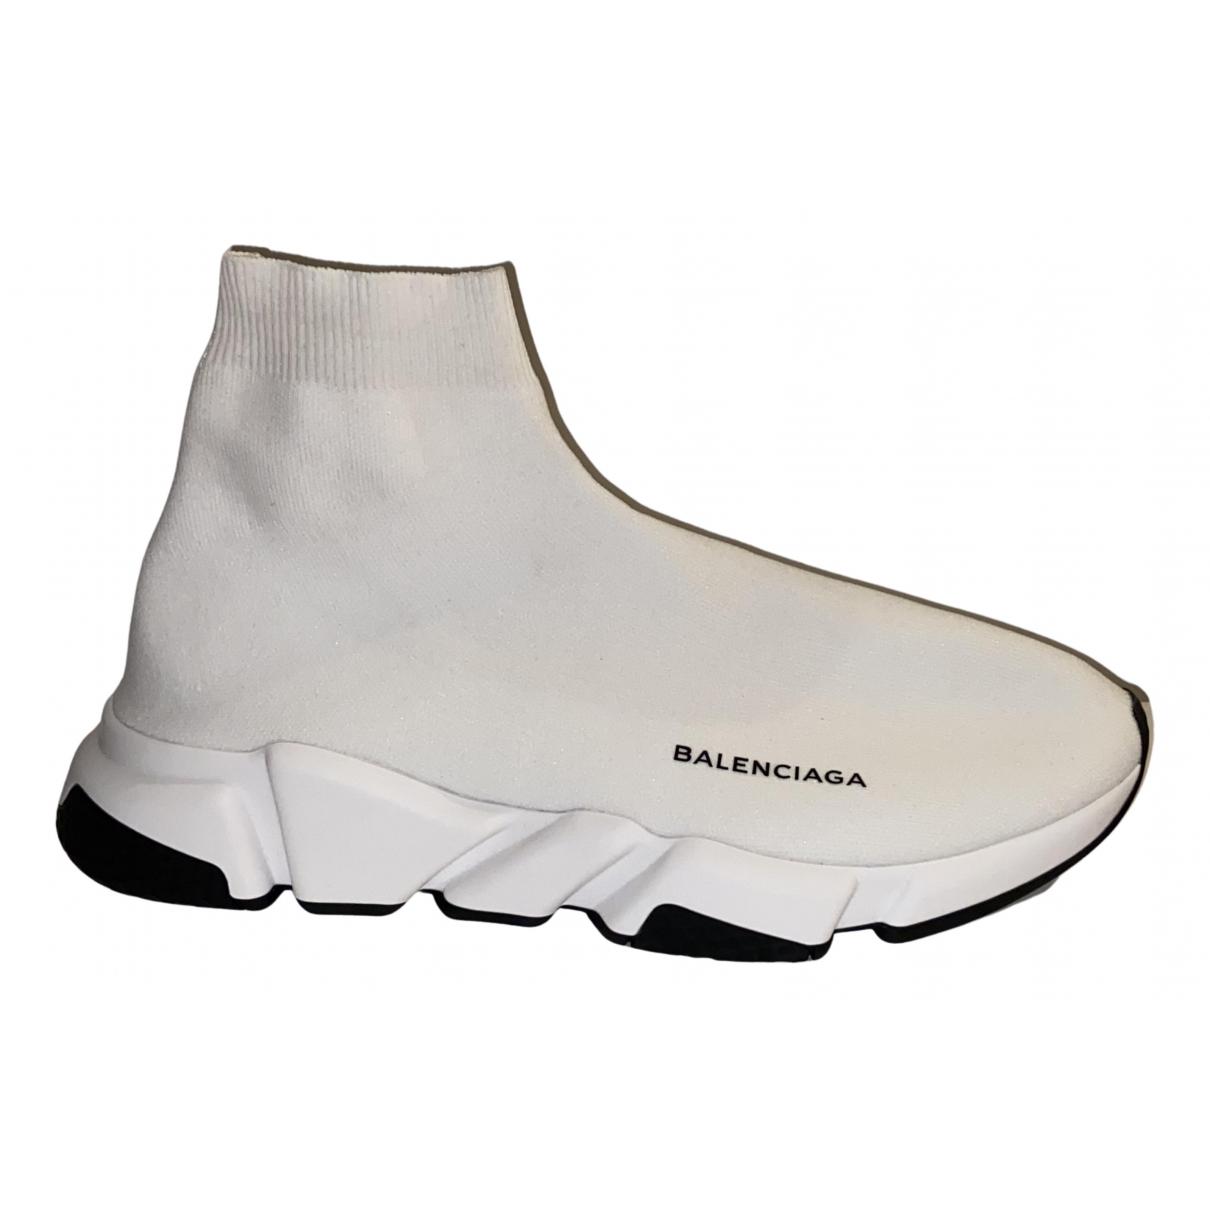 Balenciaga - Baskets Speed pour homme en toile - blanc